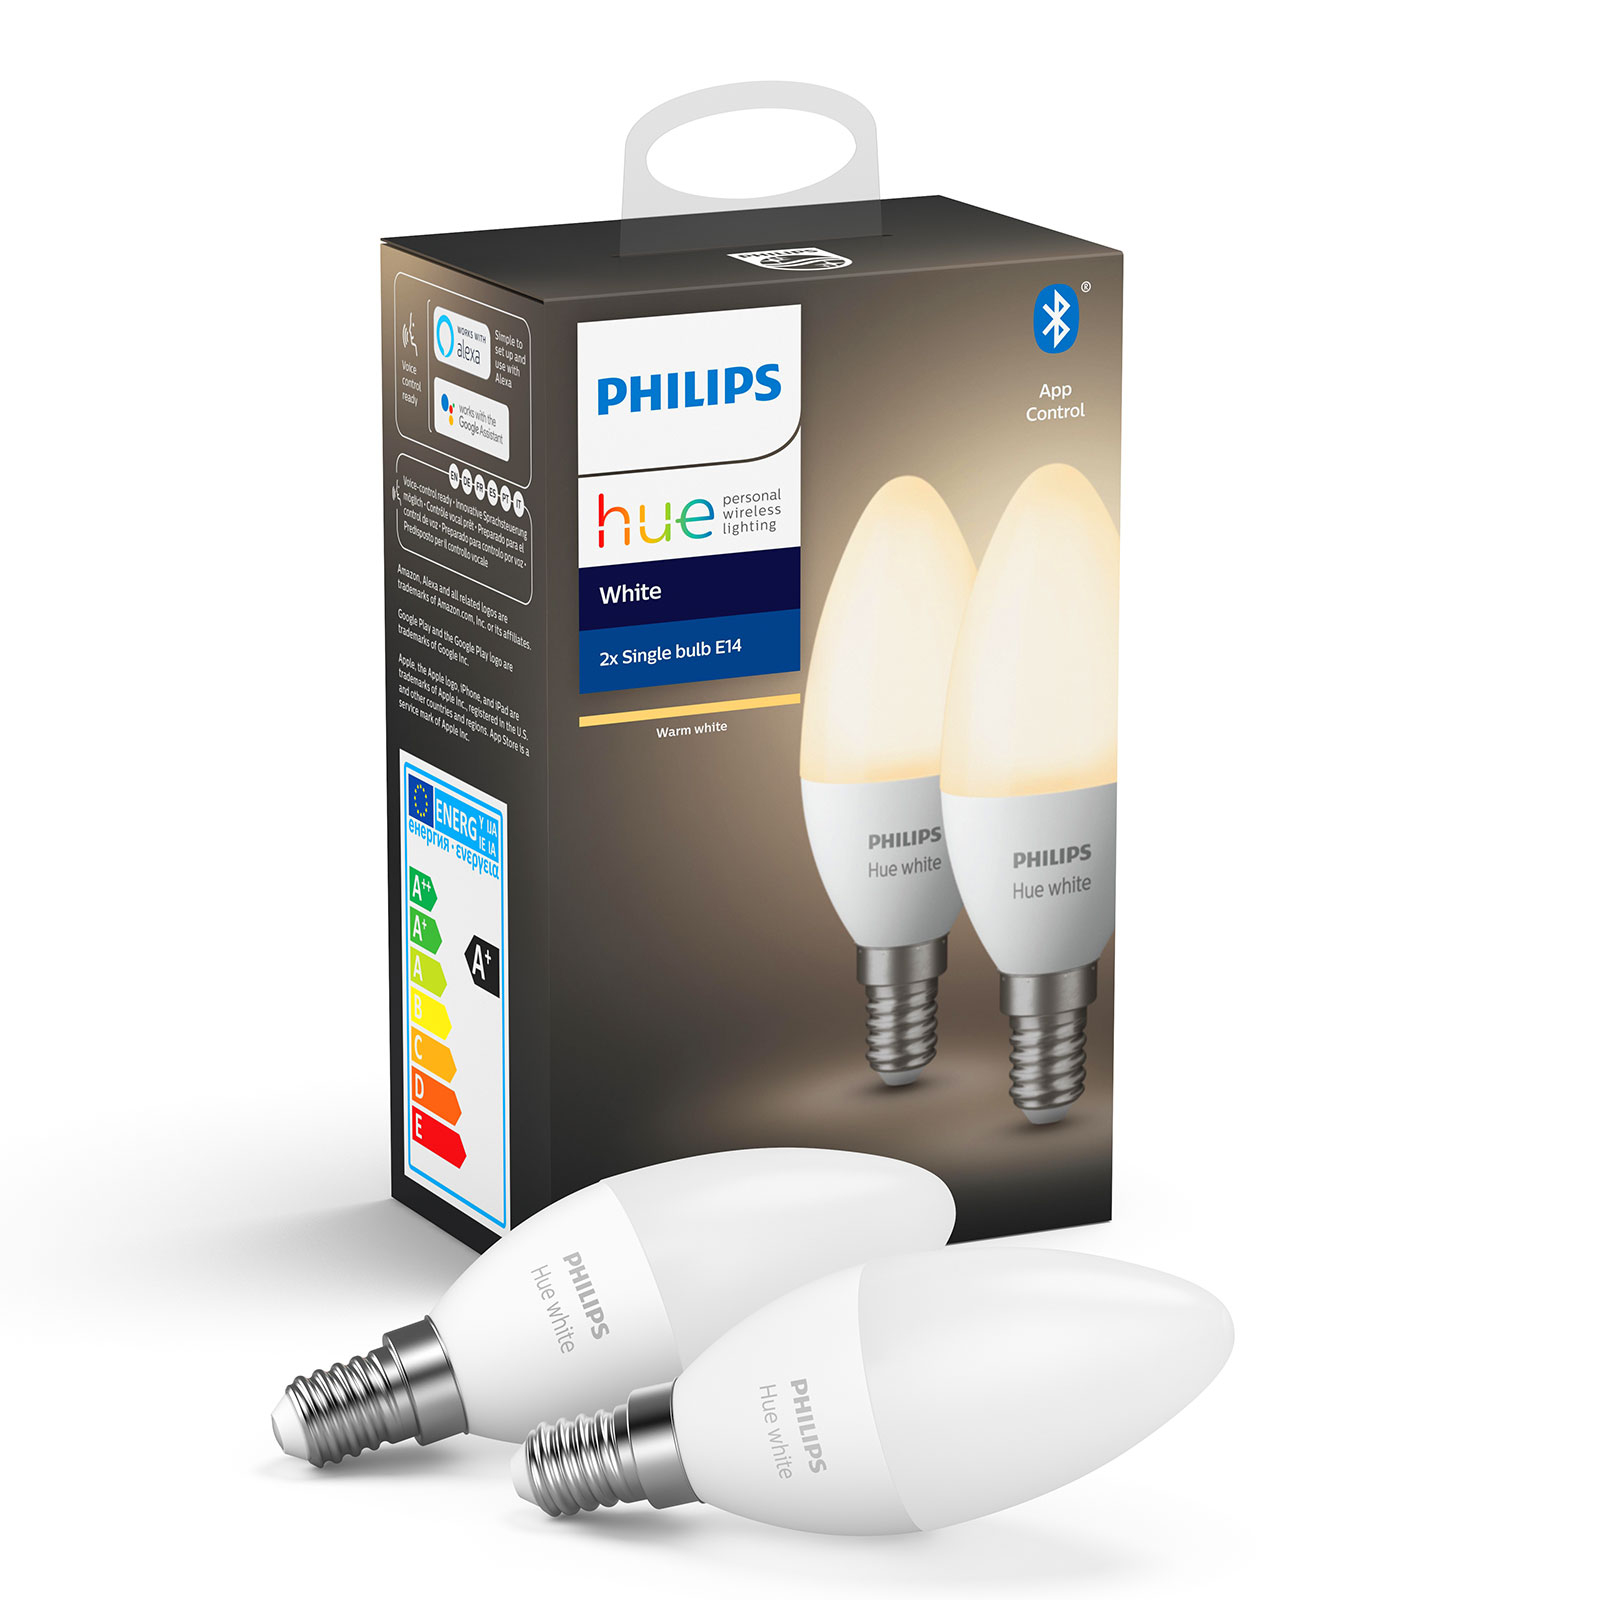 Philips Hue White 5,5W E14 2 ampoules flamme LED